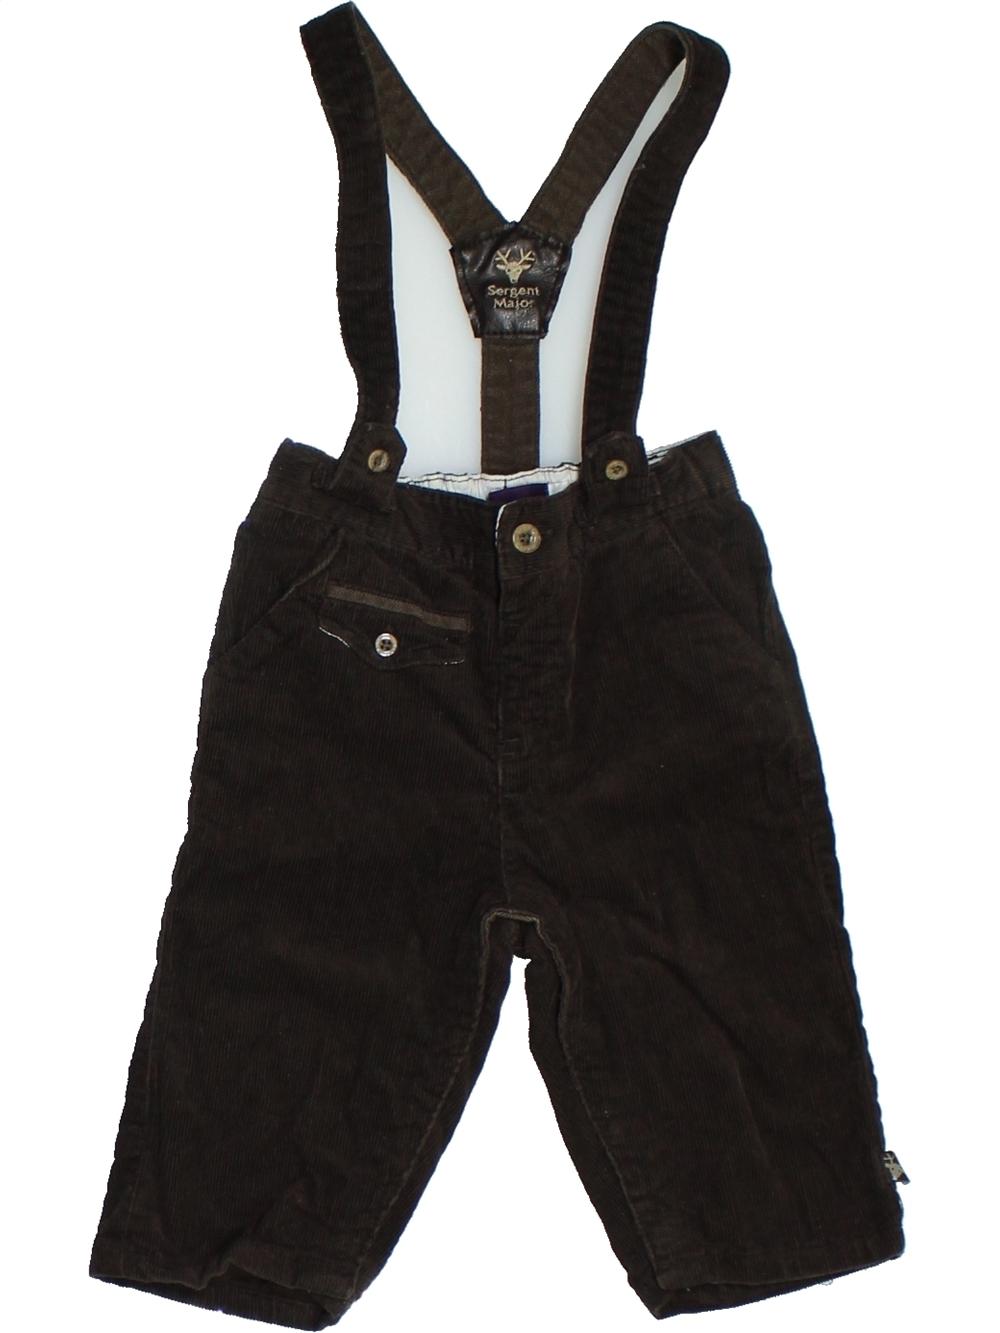 Pantalon-bebe-garcon-SERGENT-MAJOR-12-mois-noir-hiver-vetement-bebe-109